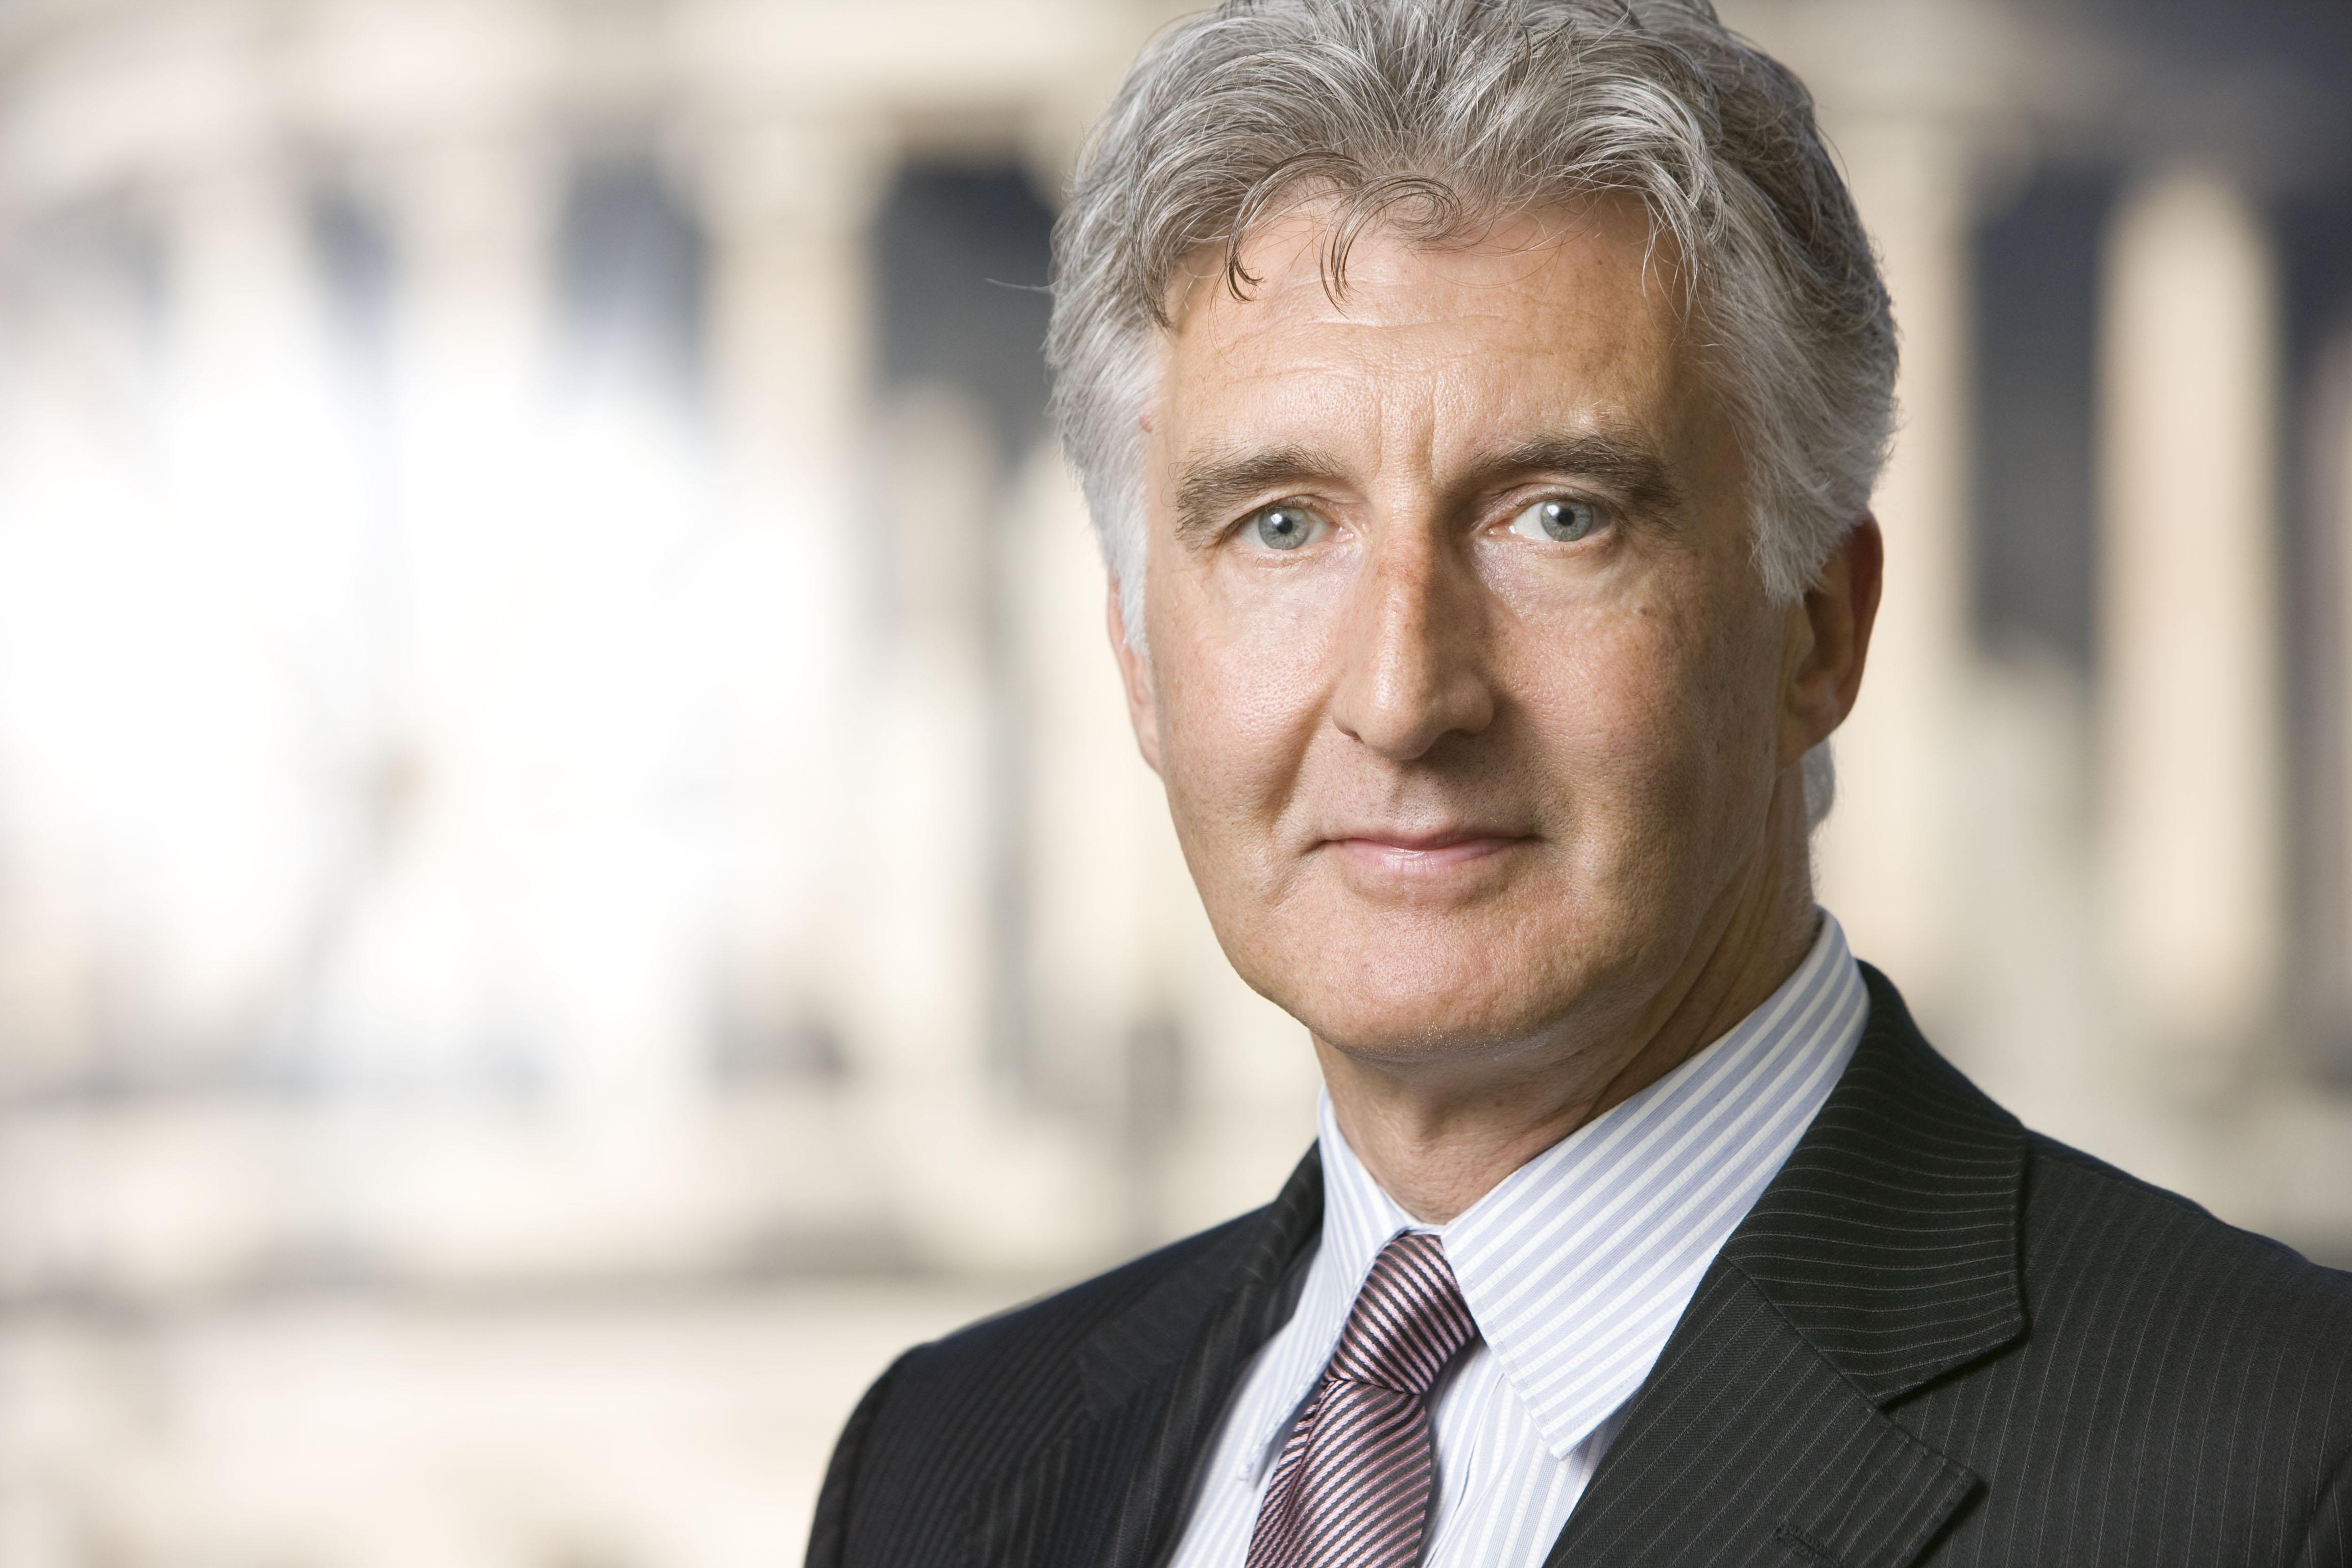 Peter Haag, BA, LL.B (University of Melbourne)